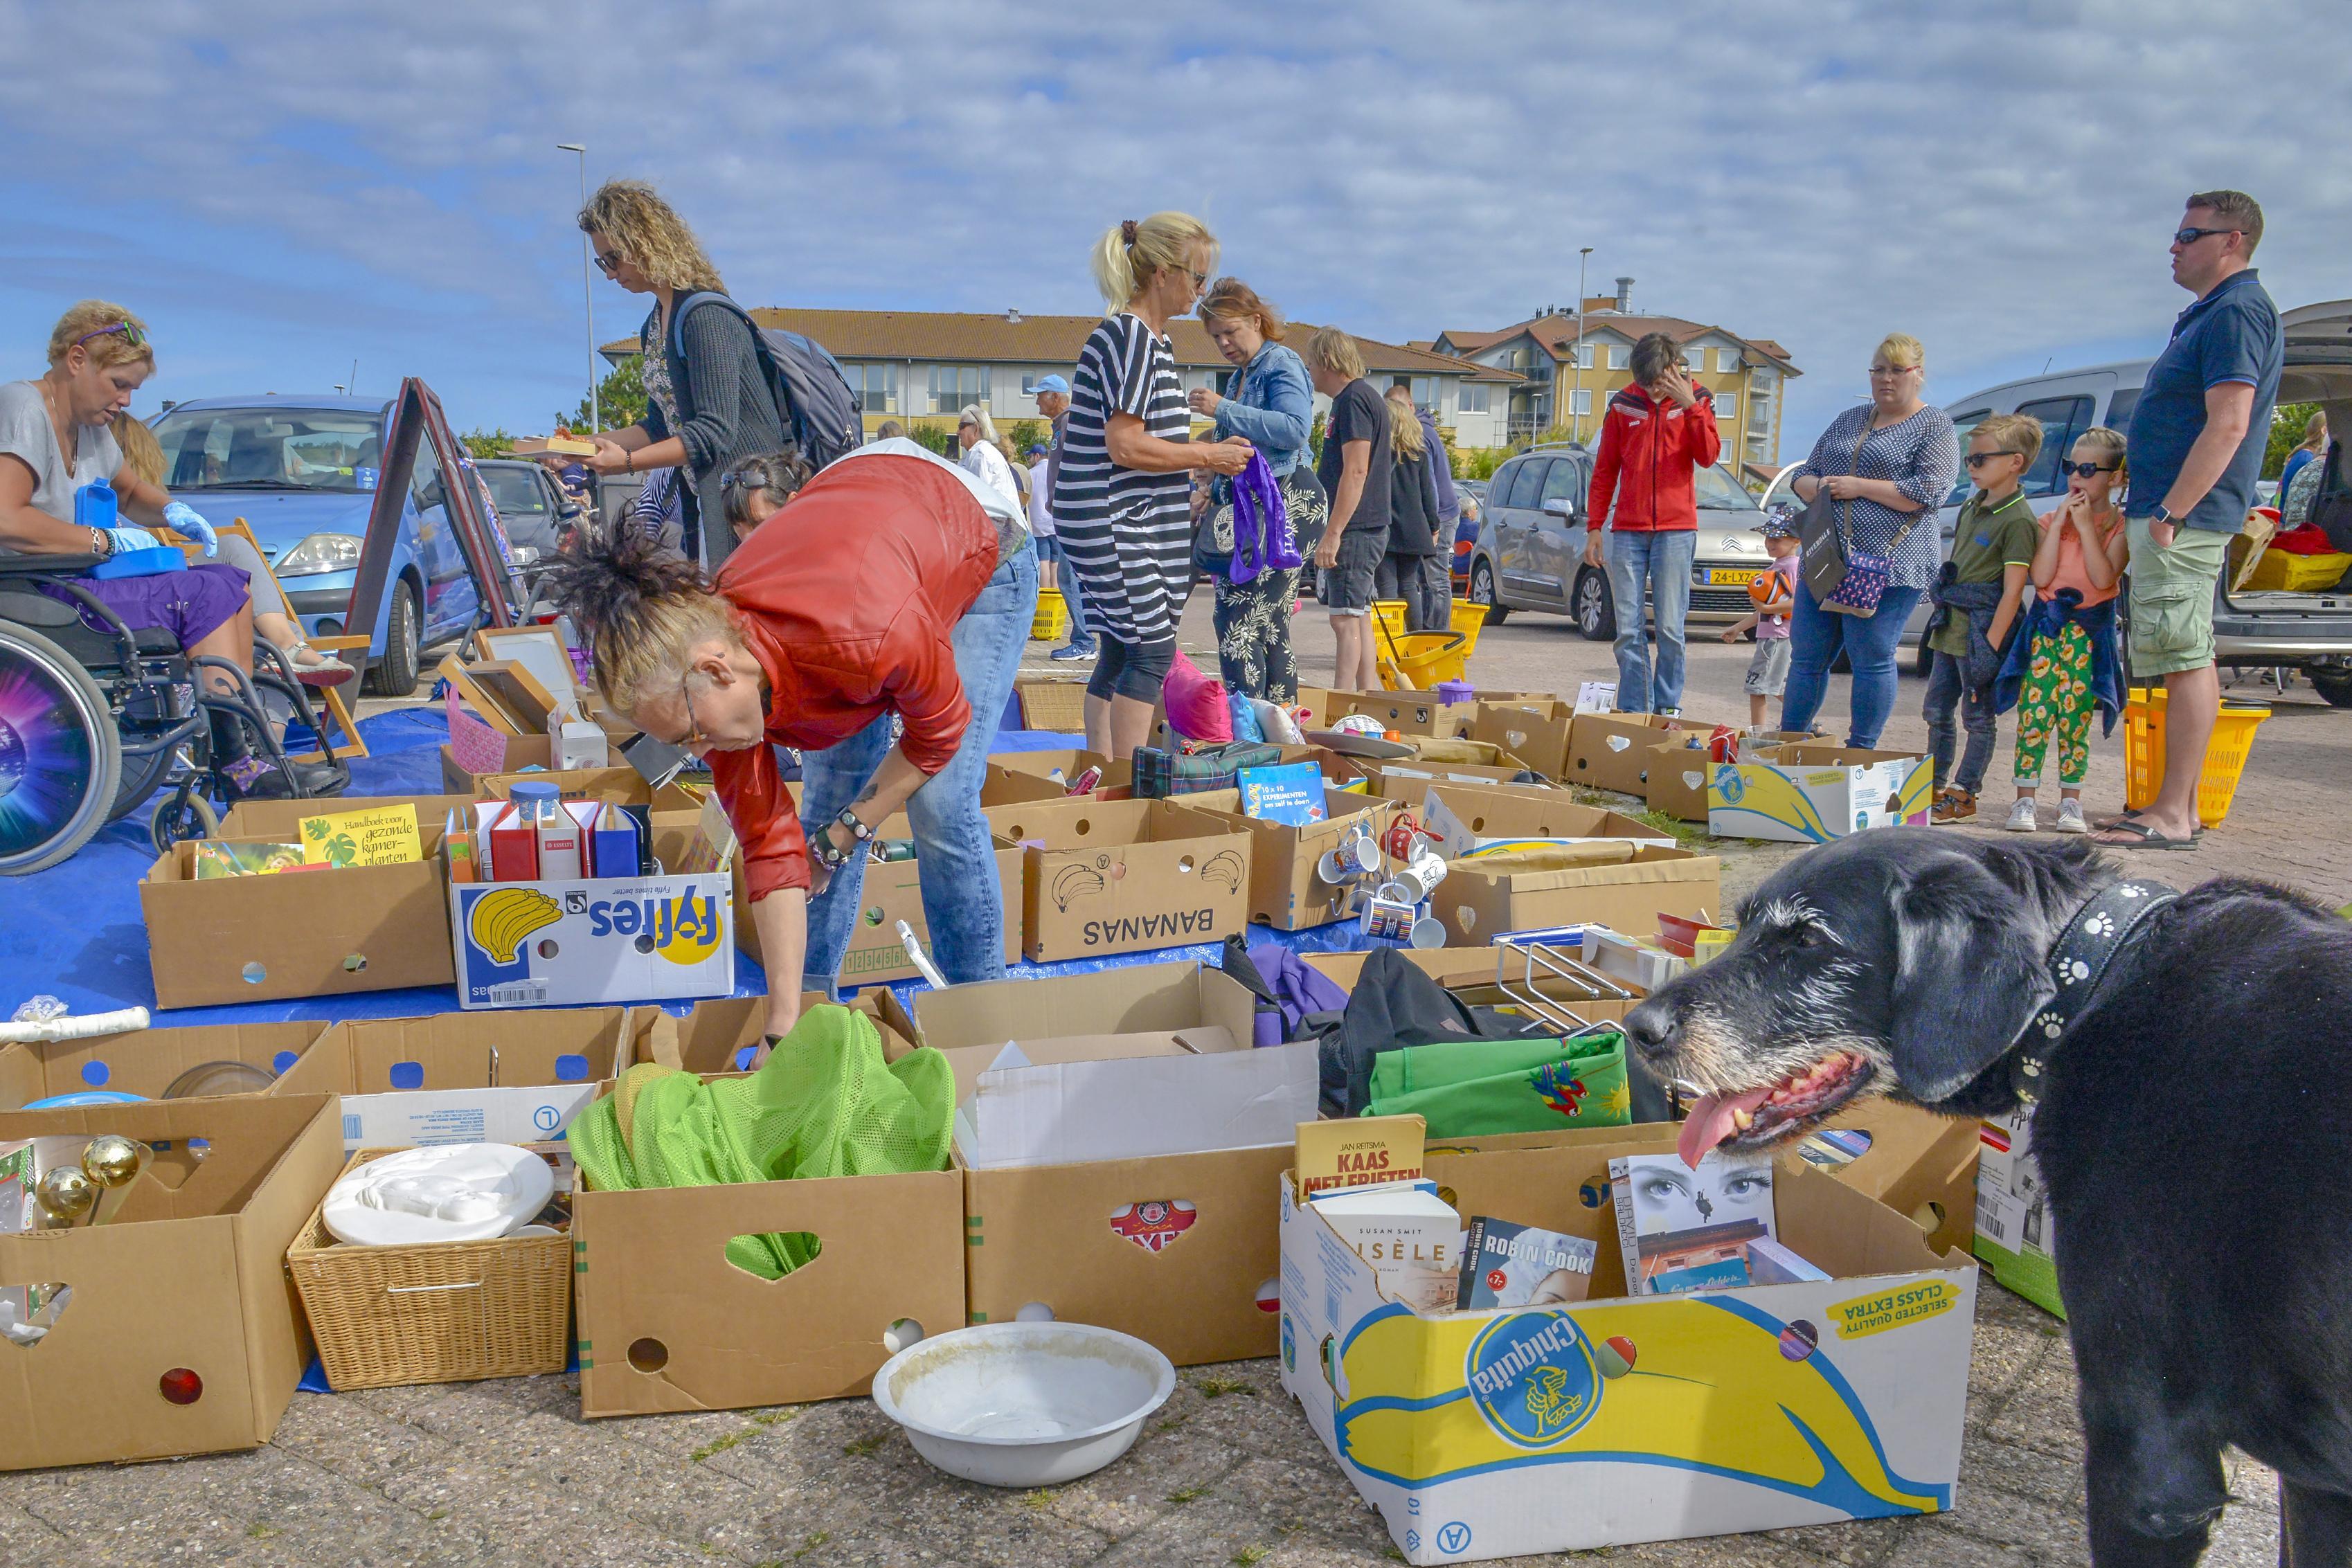 Coronaproof snuffelen op kofferbakmarkt in De Koog